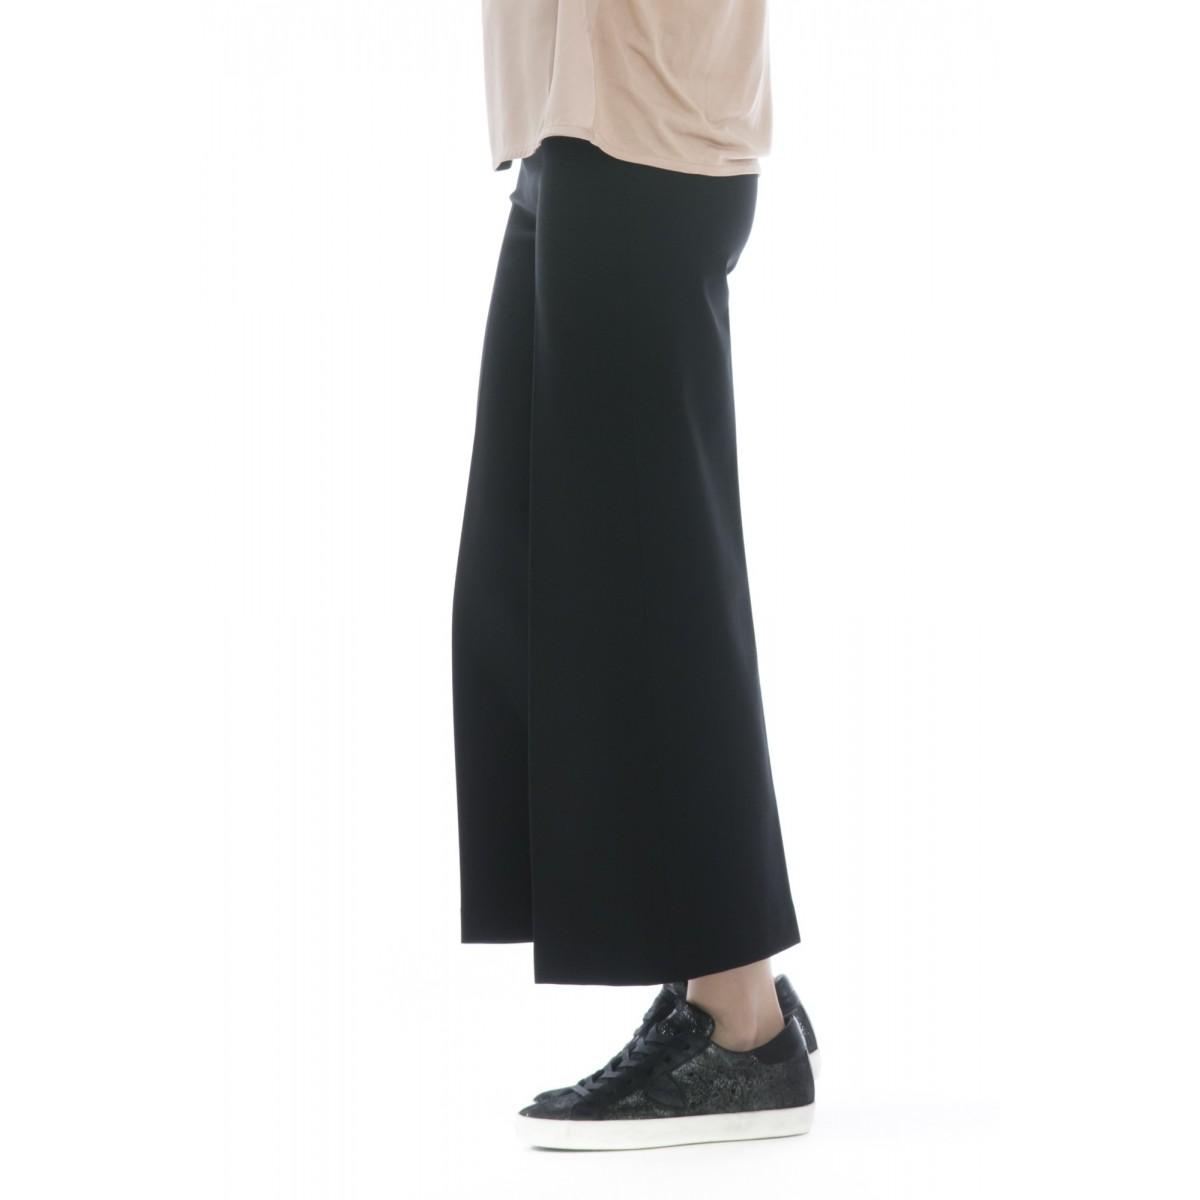 Pantalone donna - J4105 pantalone punto milano ampio elastico